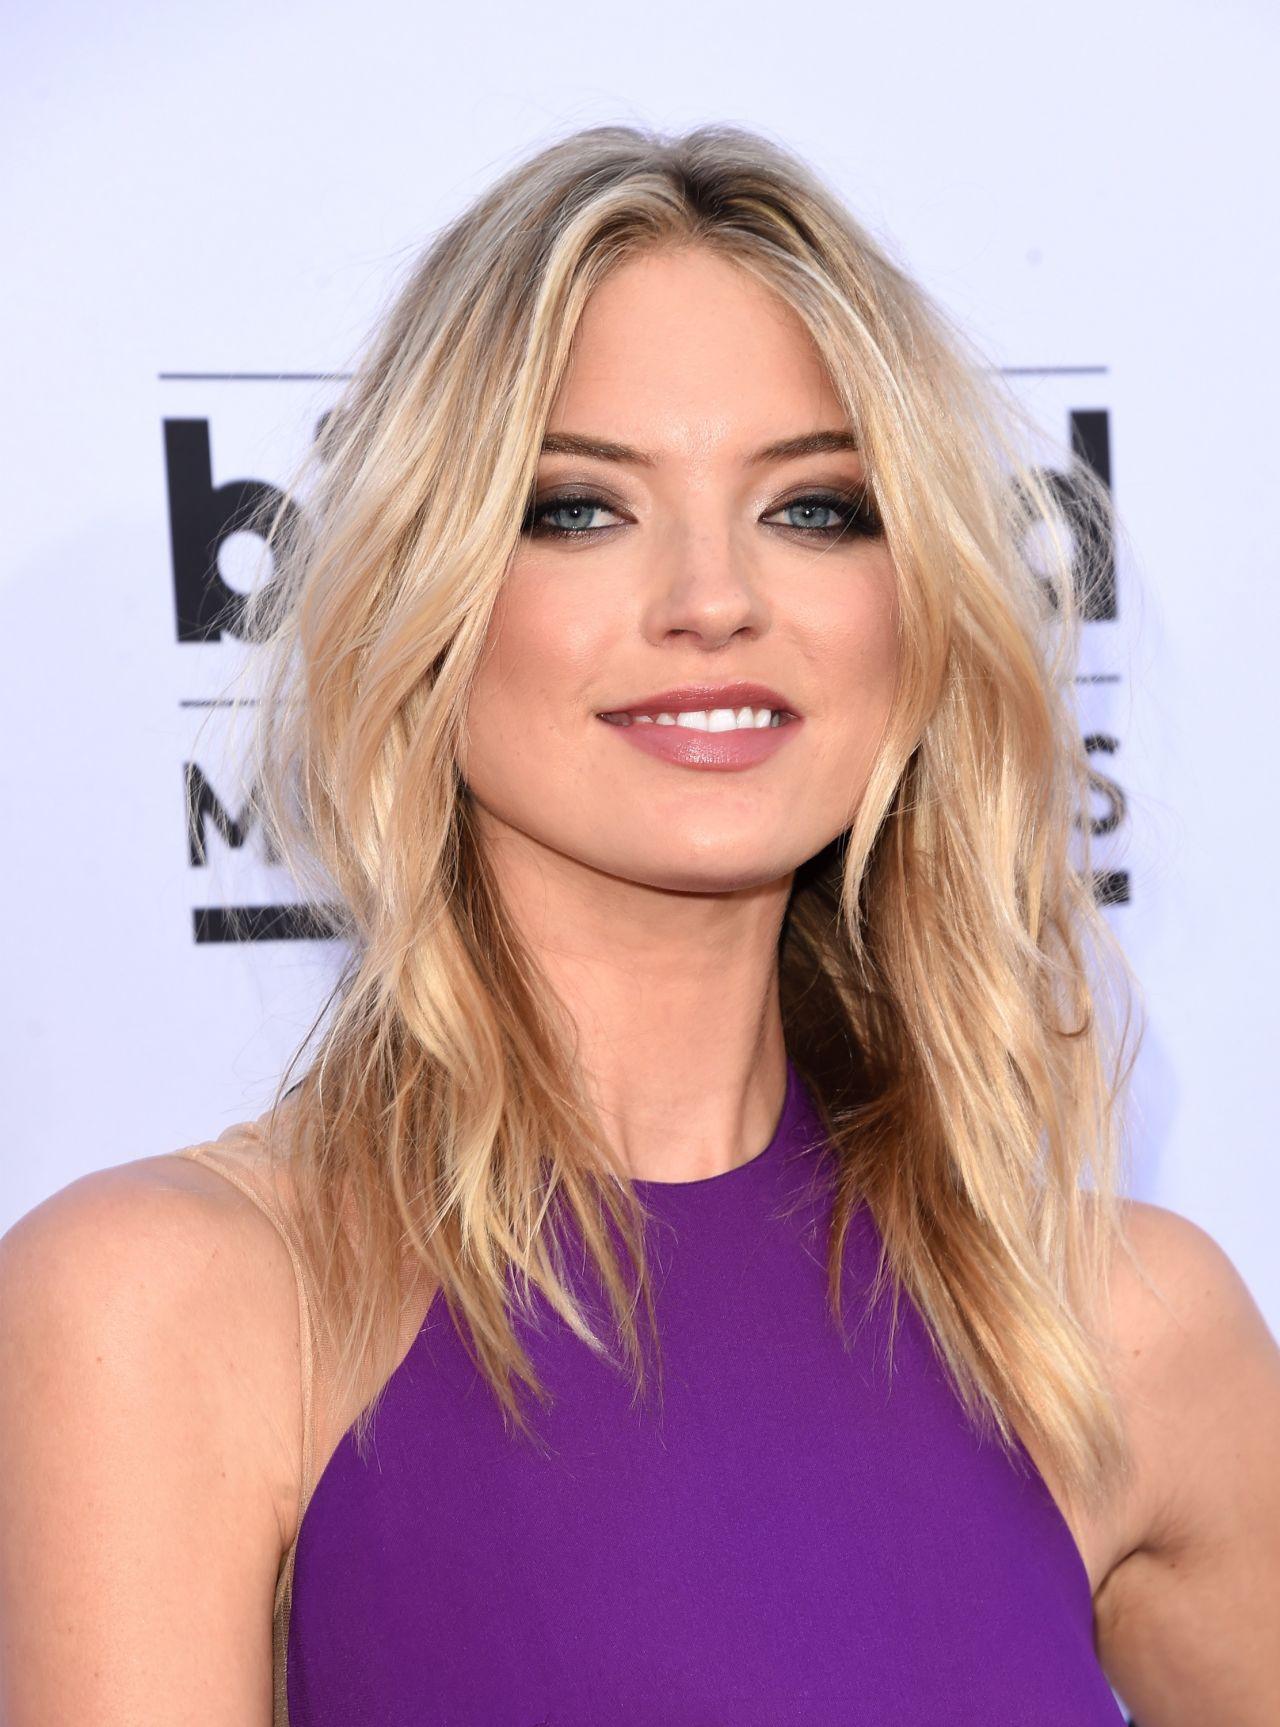 <b>Martha Hunt</b> – 2015 Billboard Music Awards in Las Vegas - martha-hunt-2015-billboard-music-awards-in-las-vegas_2